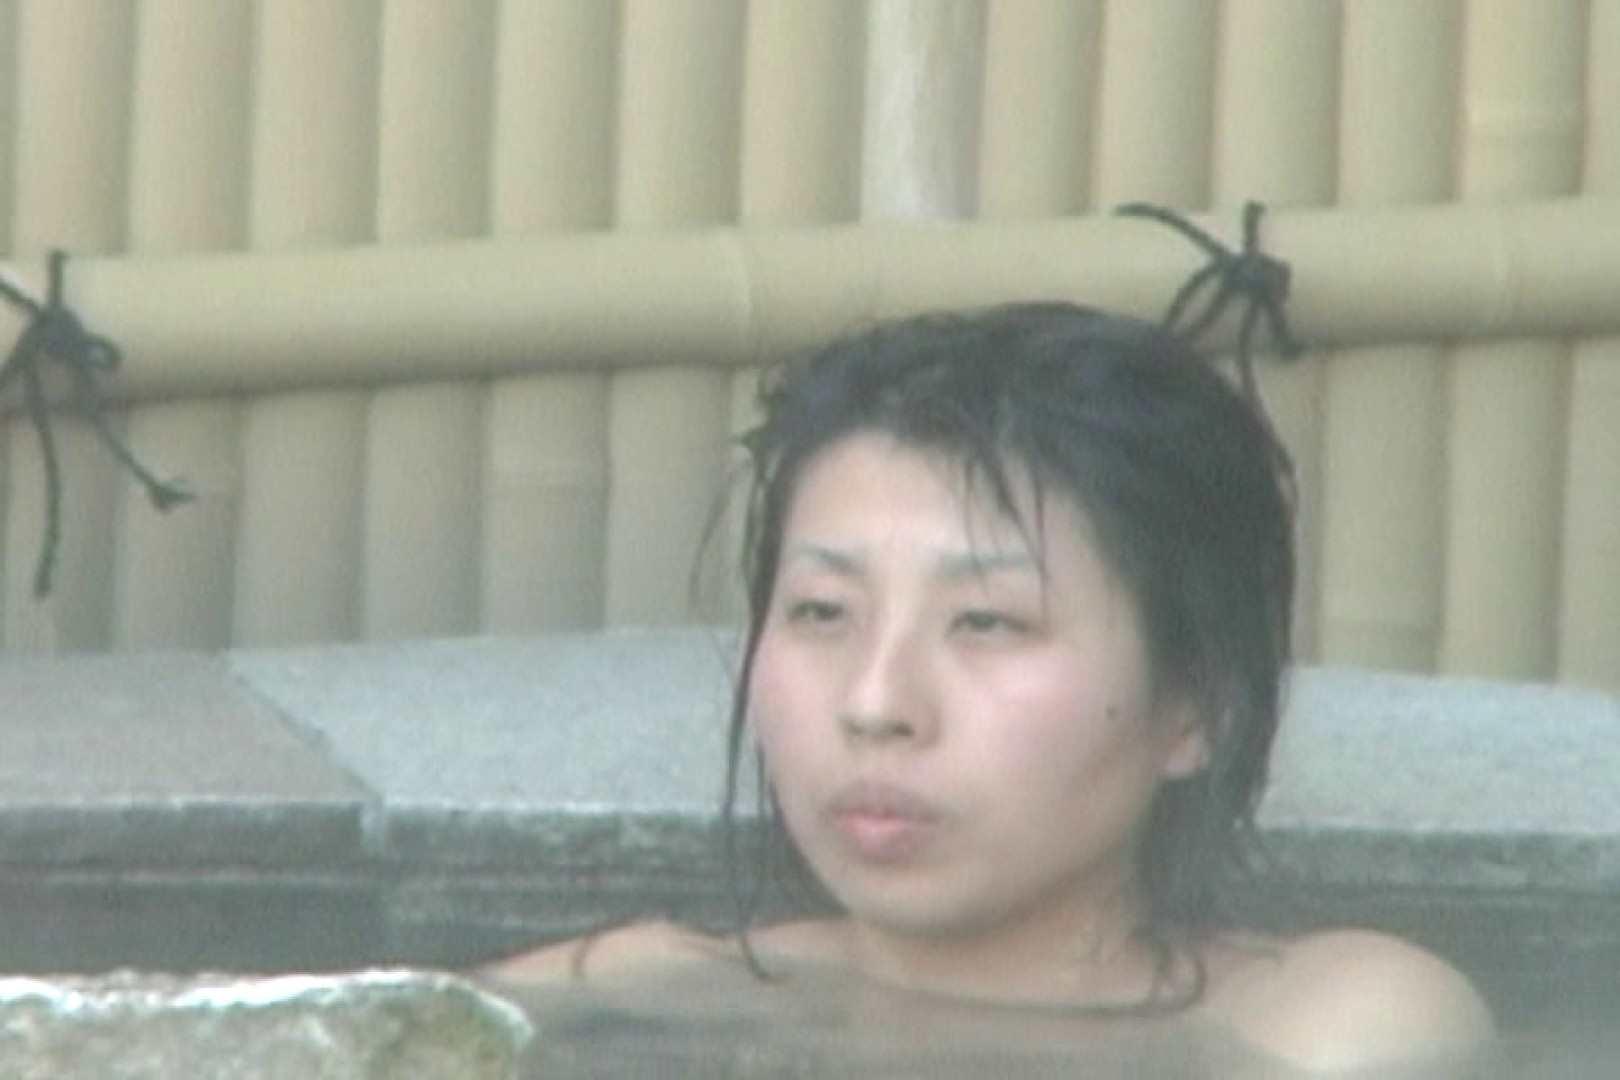 Aquaな露天風呂Vol.589 盗撮 | HなOL  105pic 46